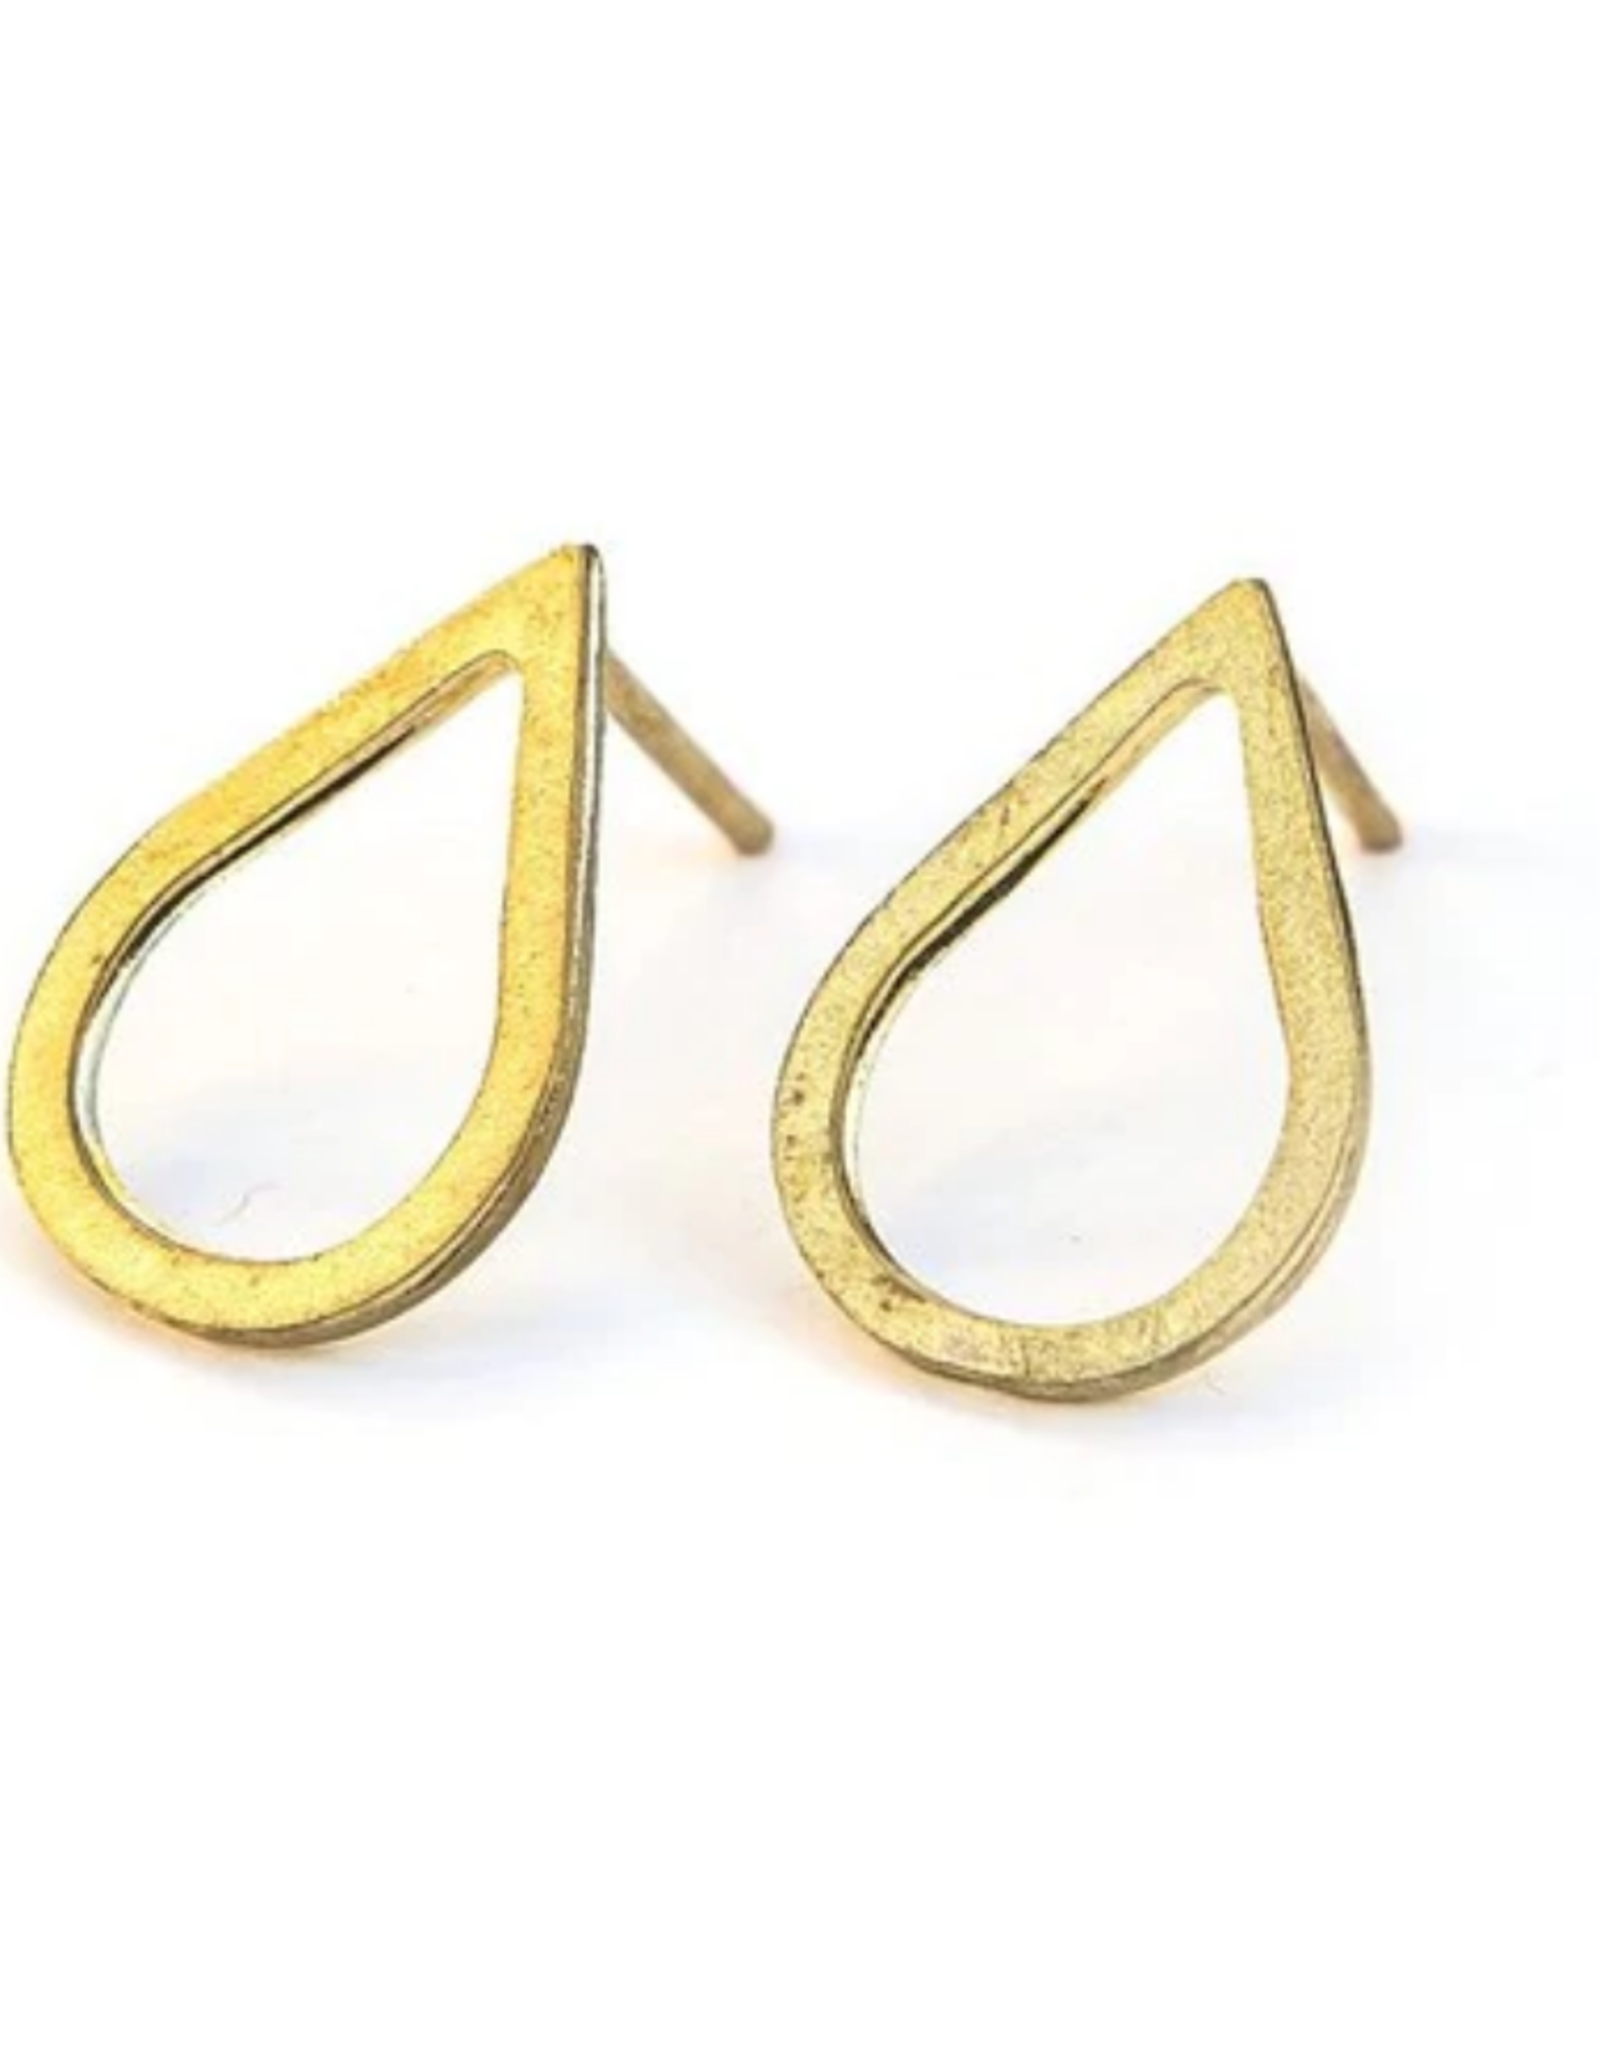 Petal Stud Earrings